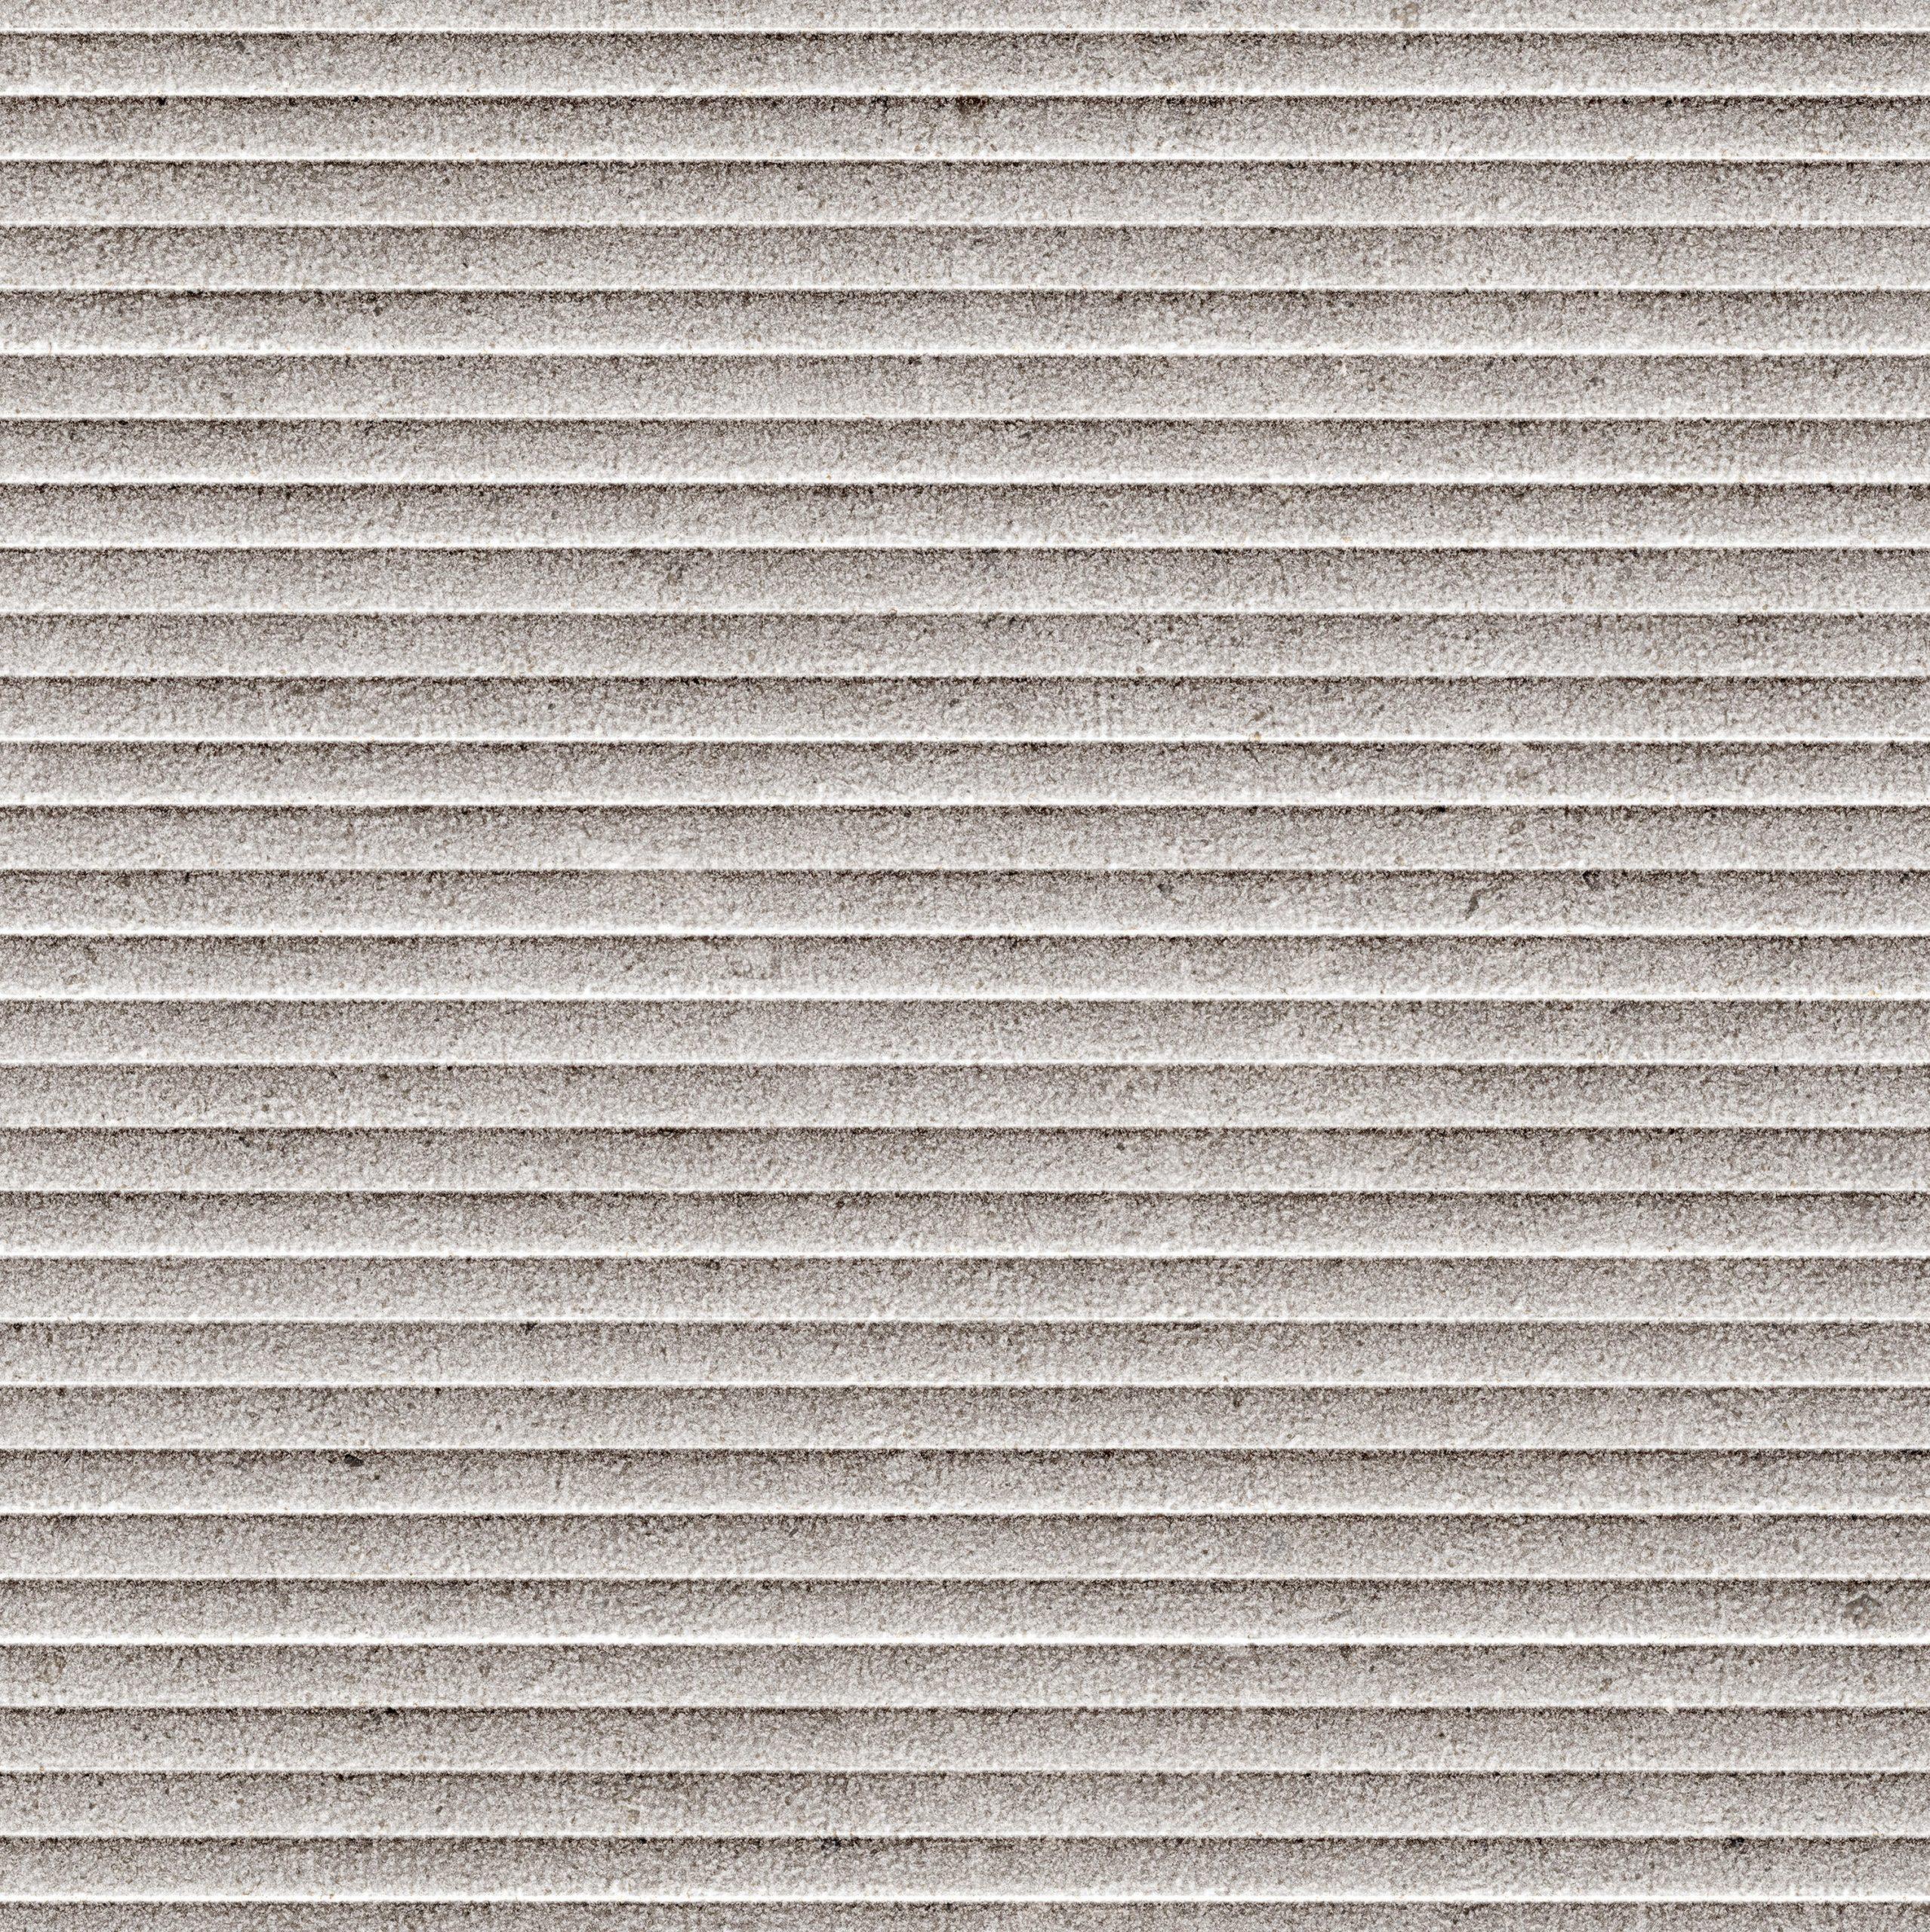 Beren Wall Light Grey Marble Trend Marble Granite